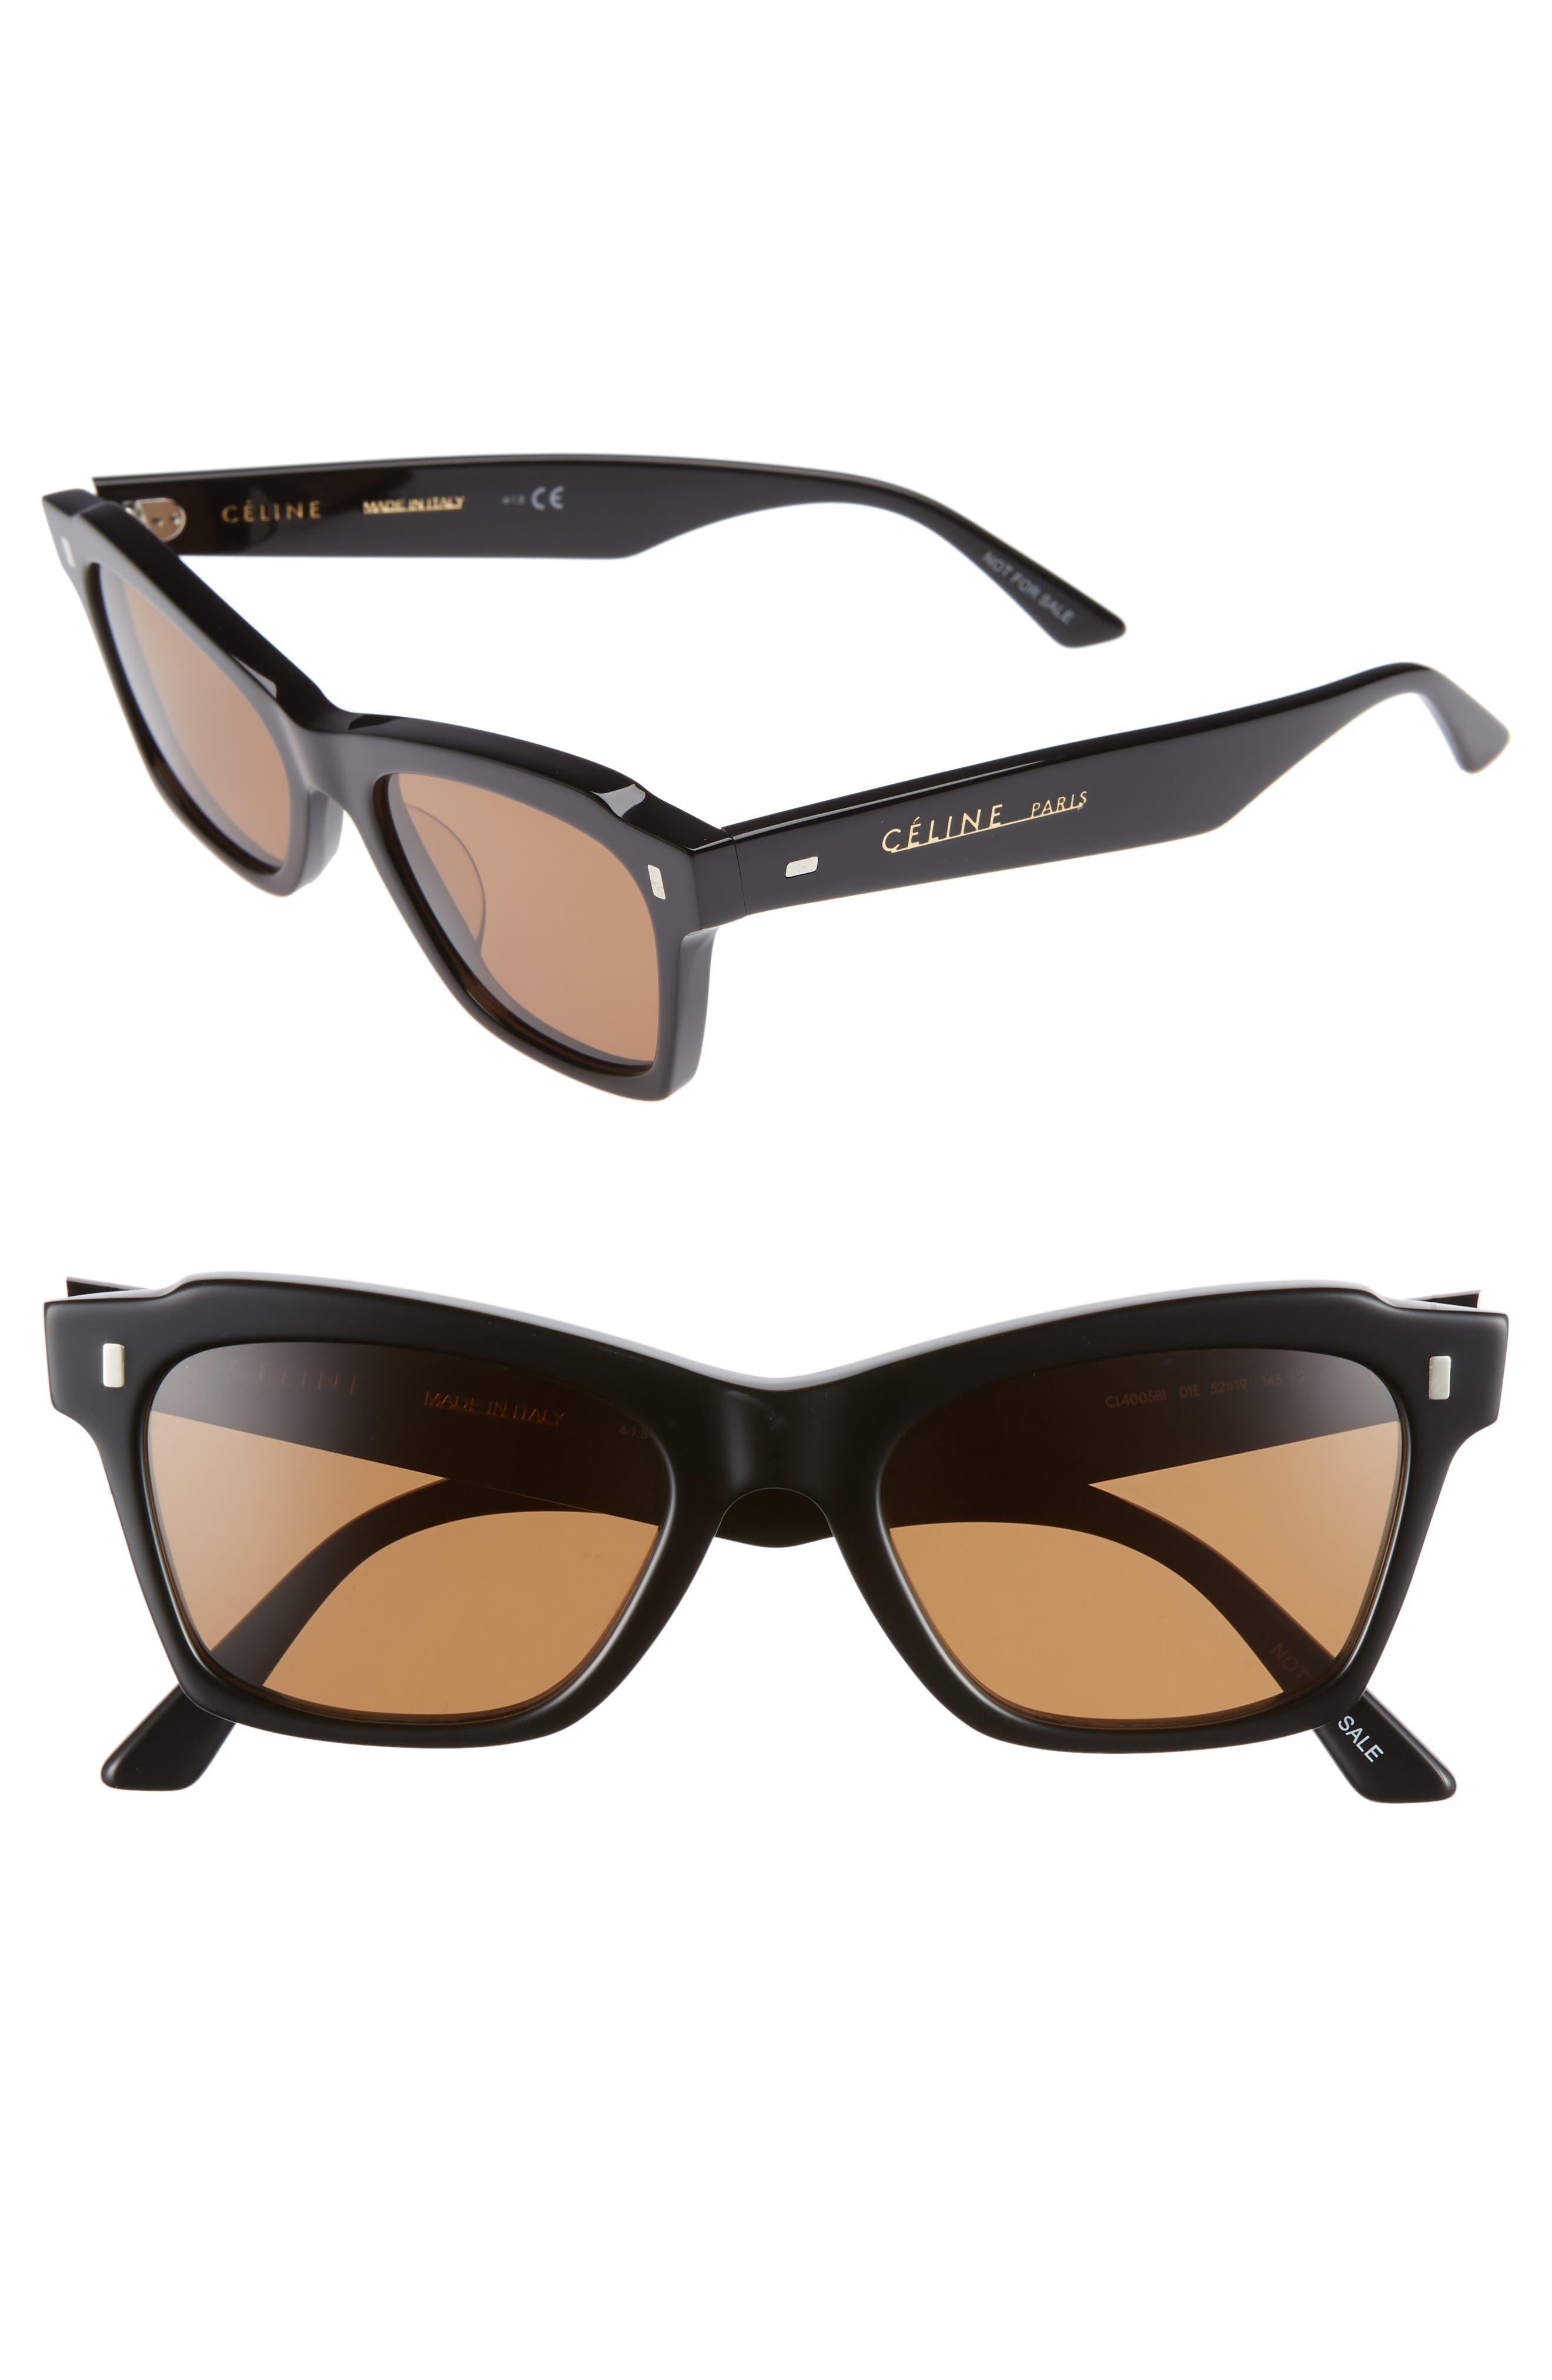 88cffb3e683 Women s CELINE Cat-Eye Sunglasses